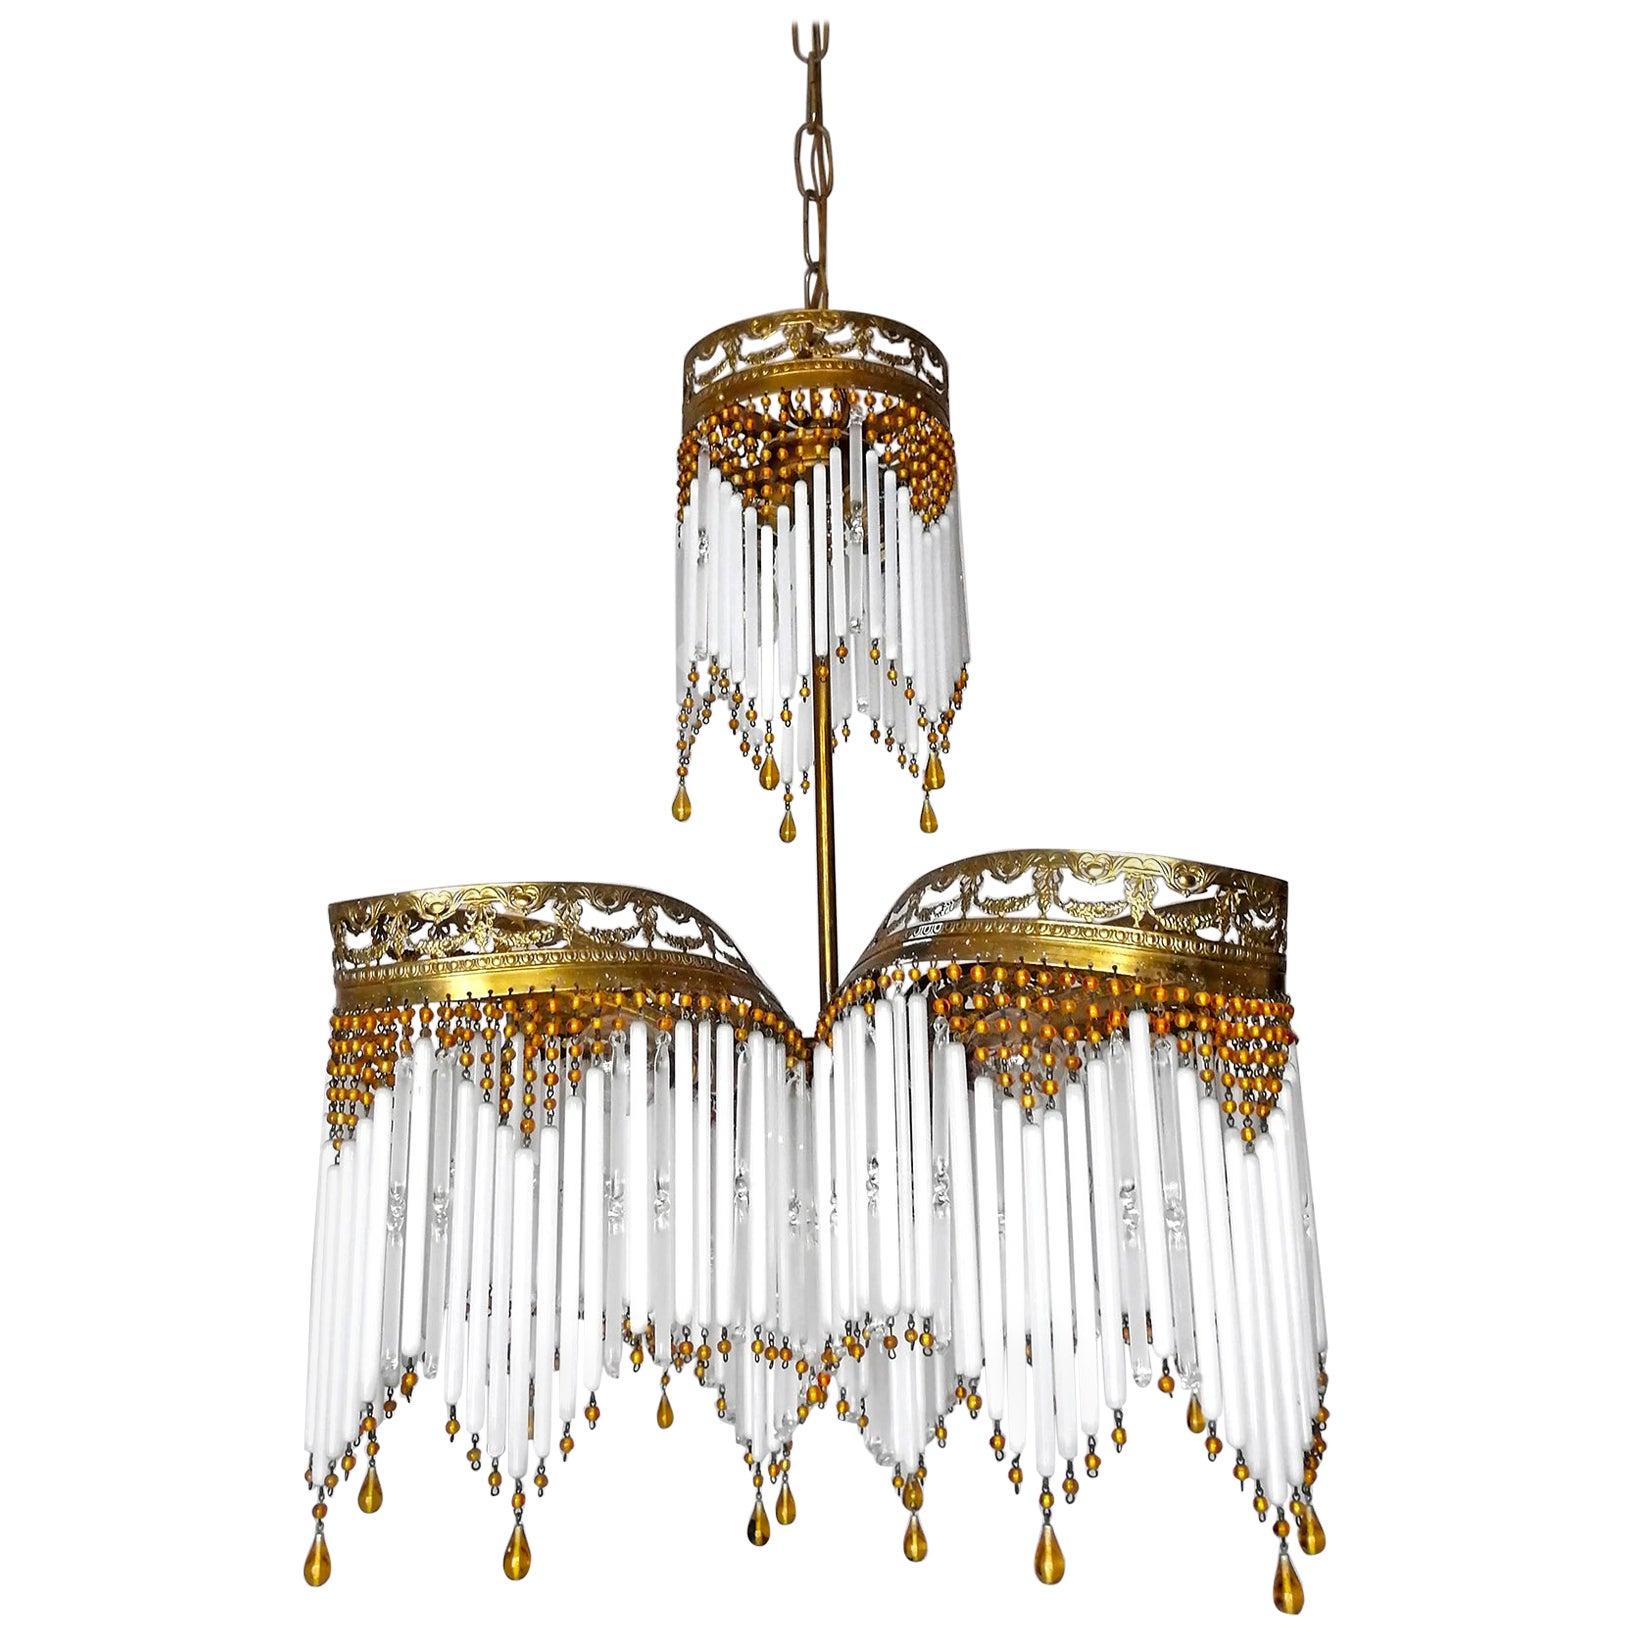 French Art Deco Art Nouveau Amber Beaded Crystal Fringe & Gilt Ornate Chandelier